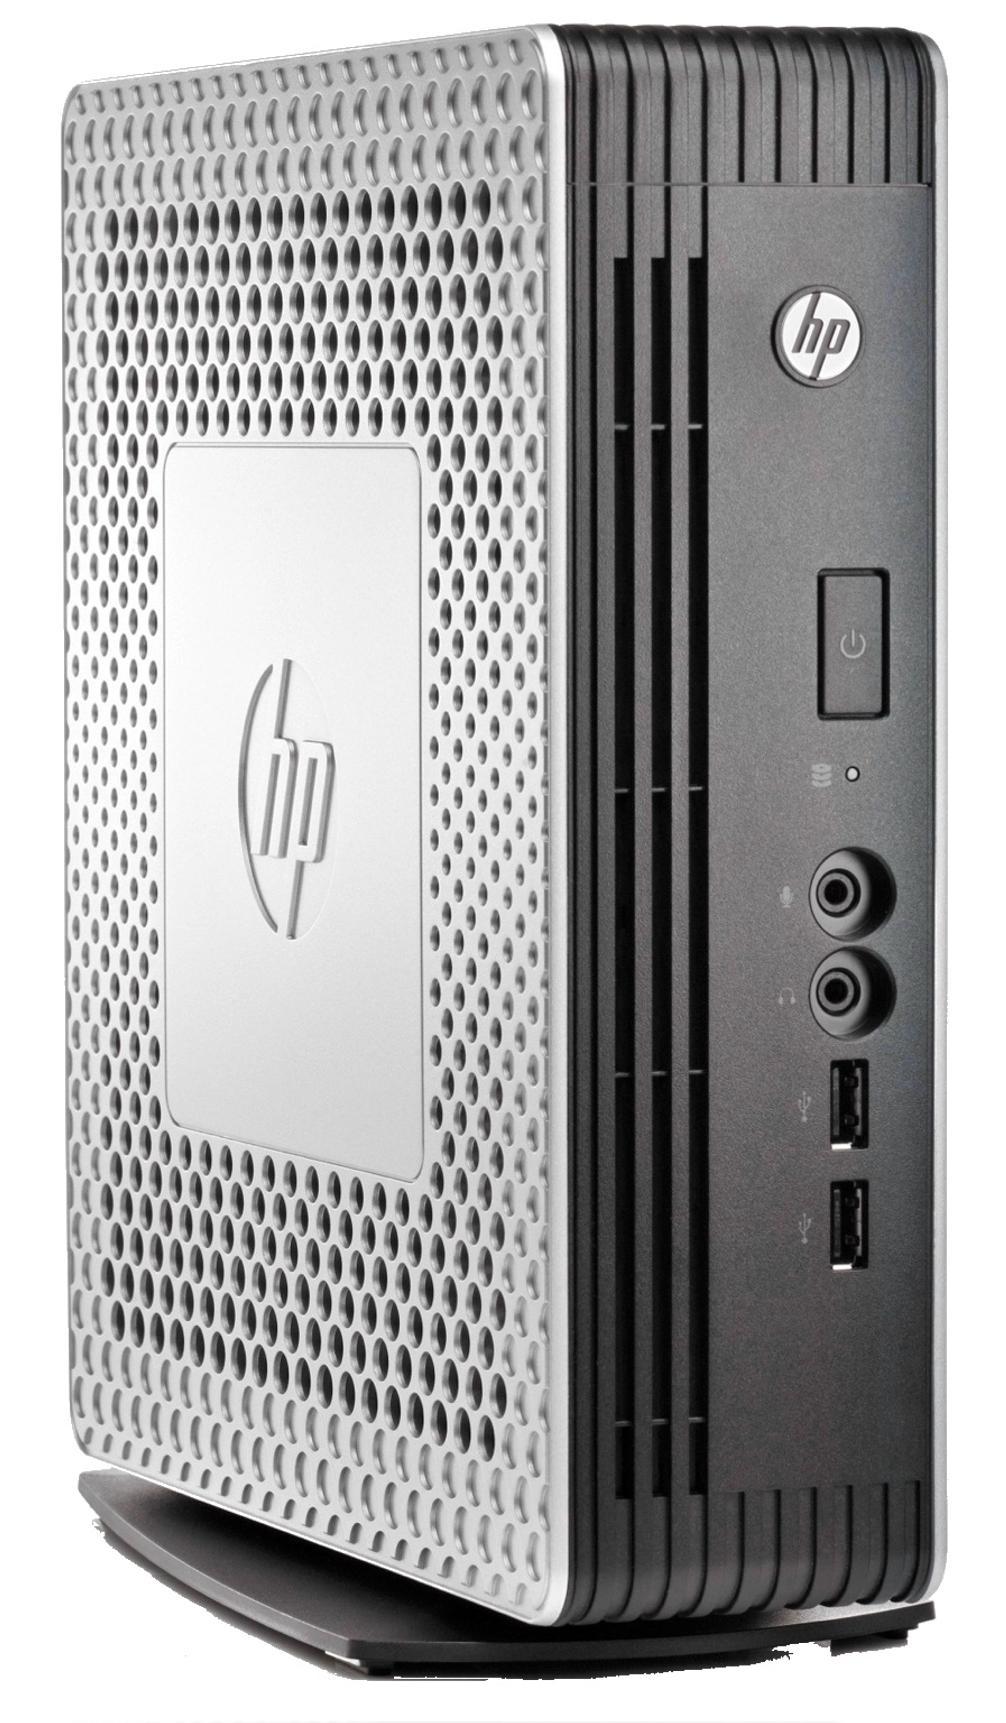 HP t610 PLUS Flexible Thin Client Dual Core (T56N) 1.65GHz 4GB LAN Windows Embedded Standard 7E